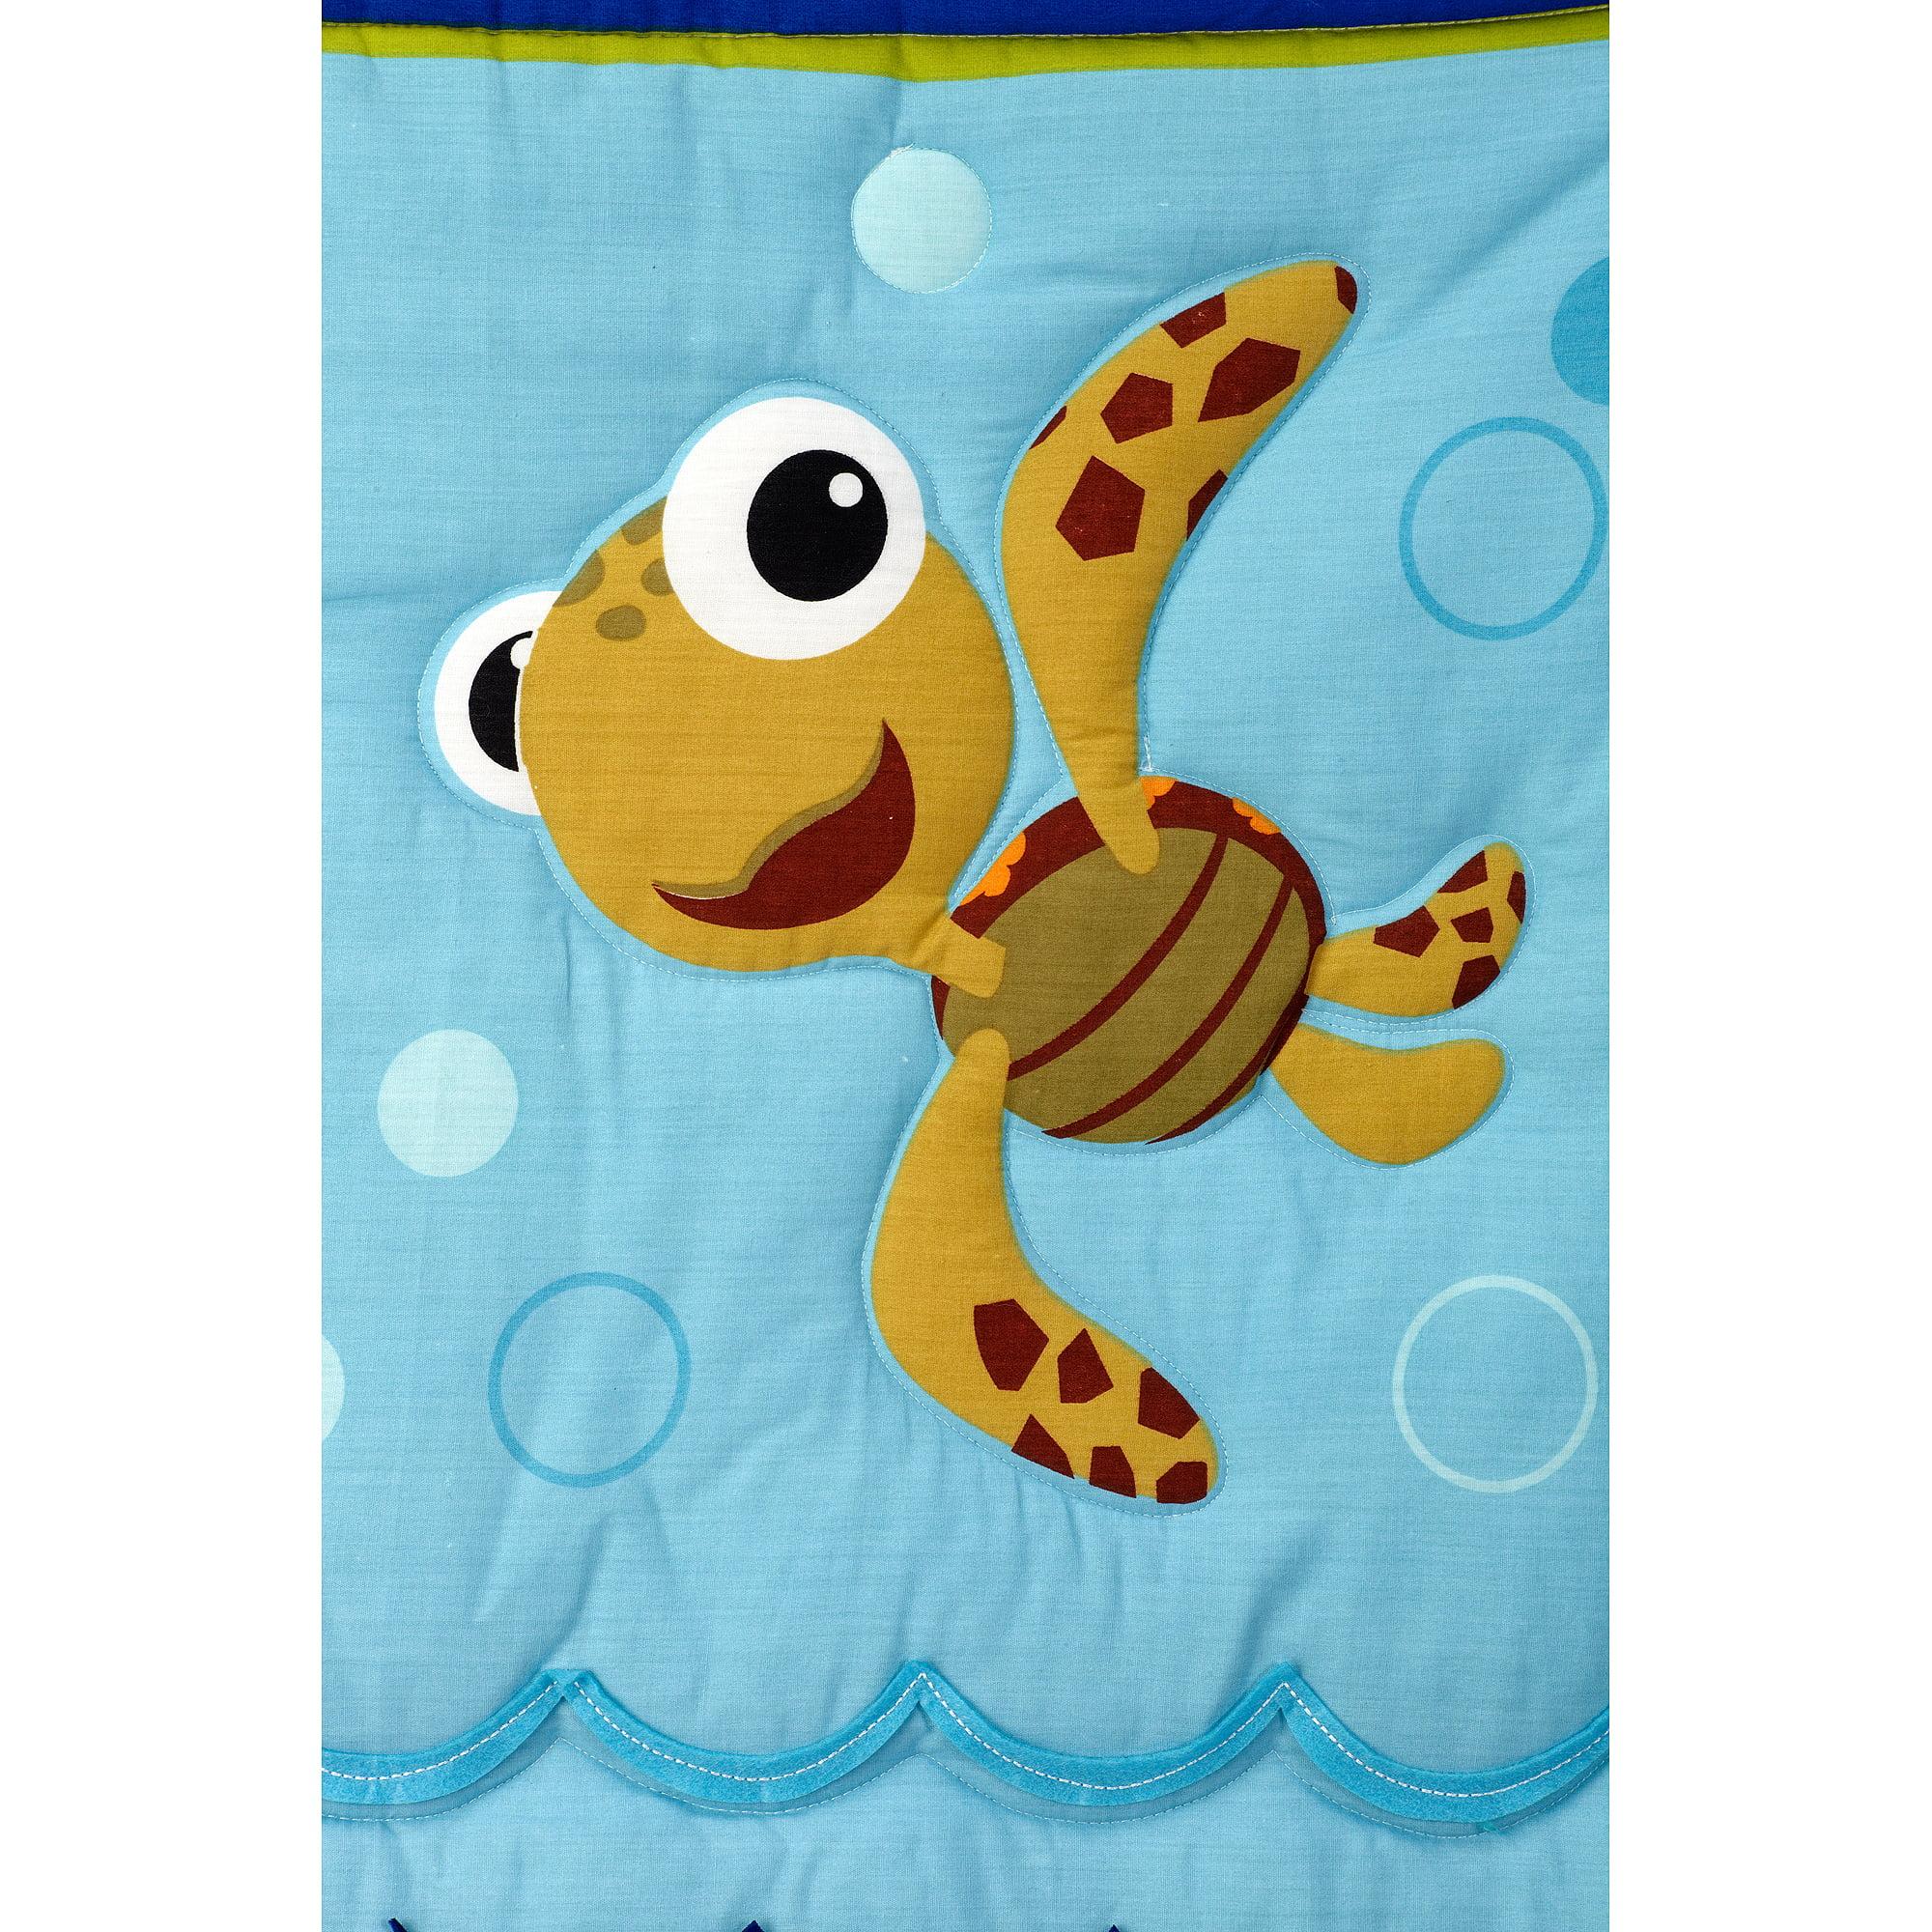 Disney Baby Bedding Nemo S Wavy Days 4 Piece Crib Set Com